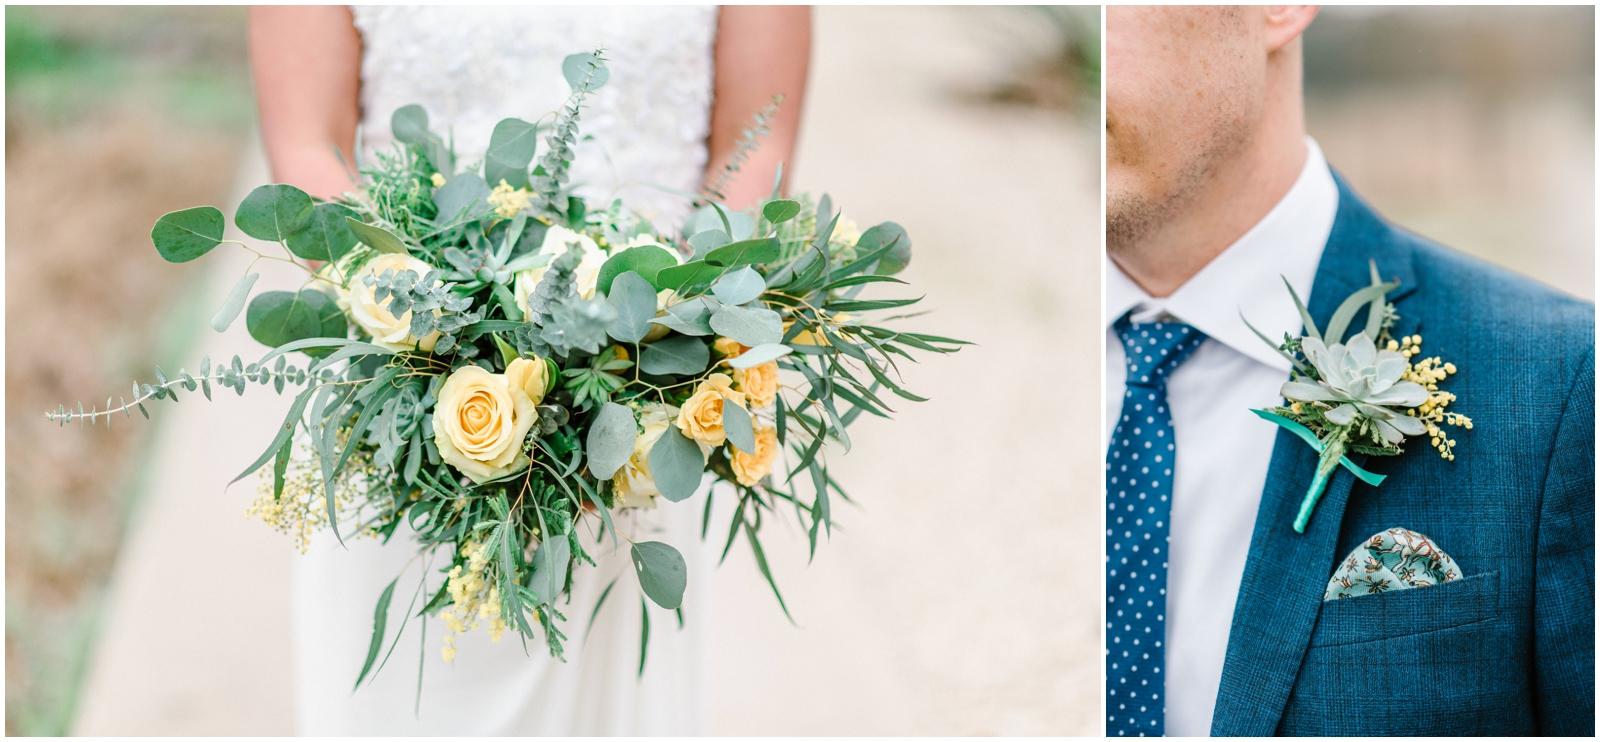 Minimalistic TX Venue Prosper House -Austin Wedding Planner_0349.jpg